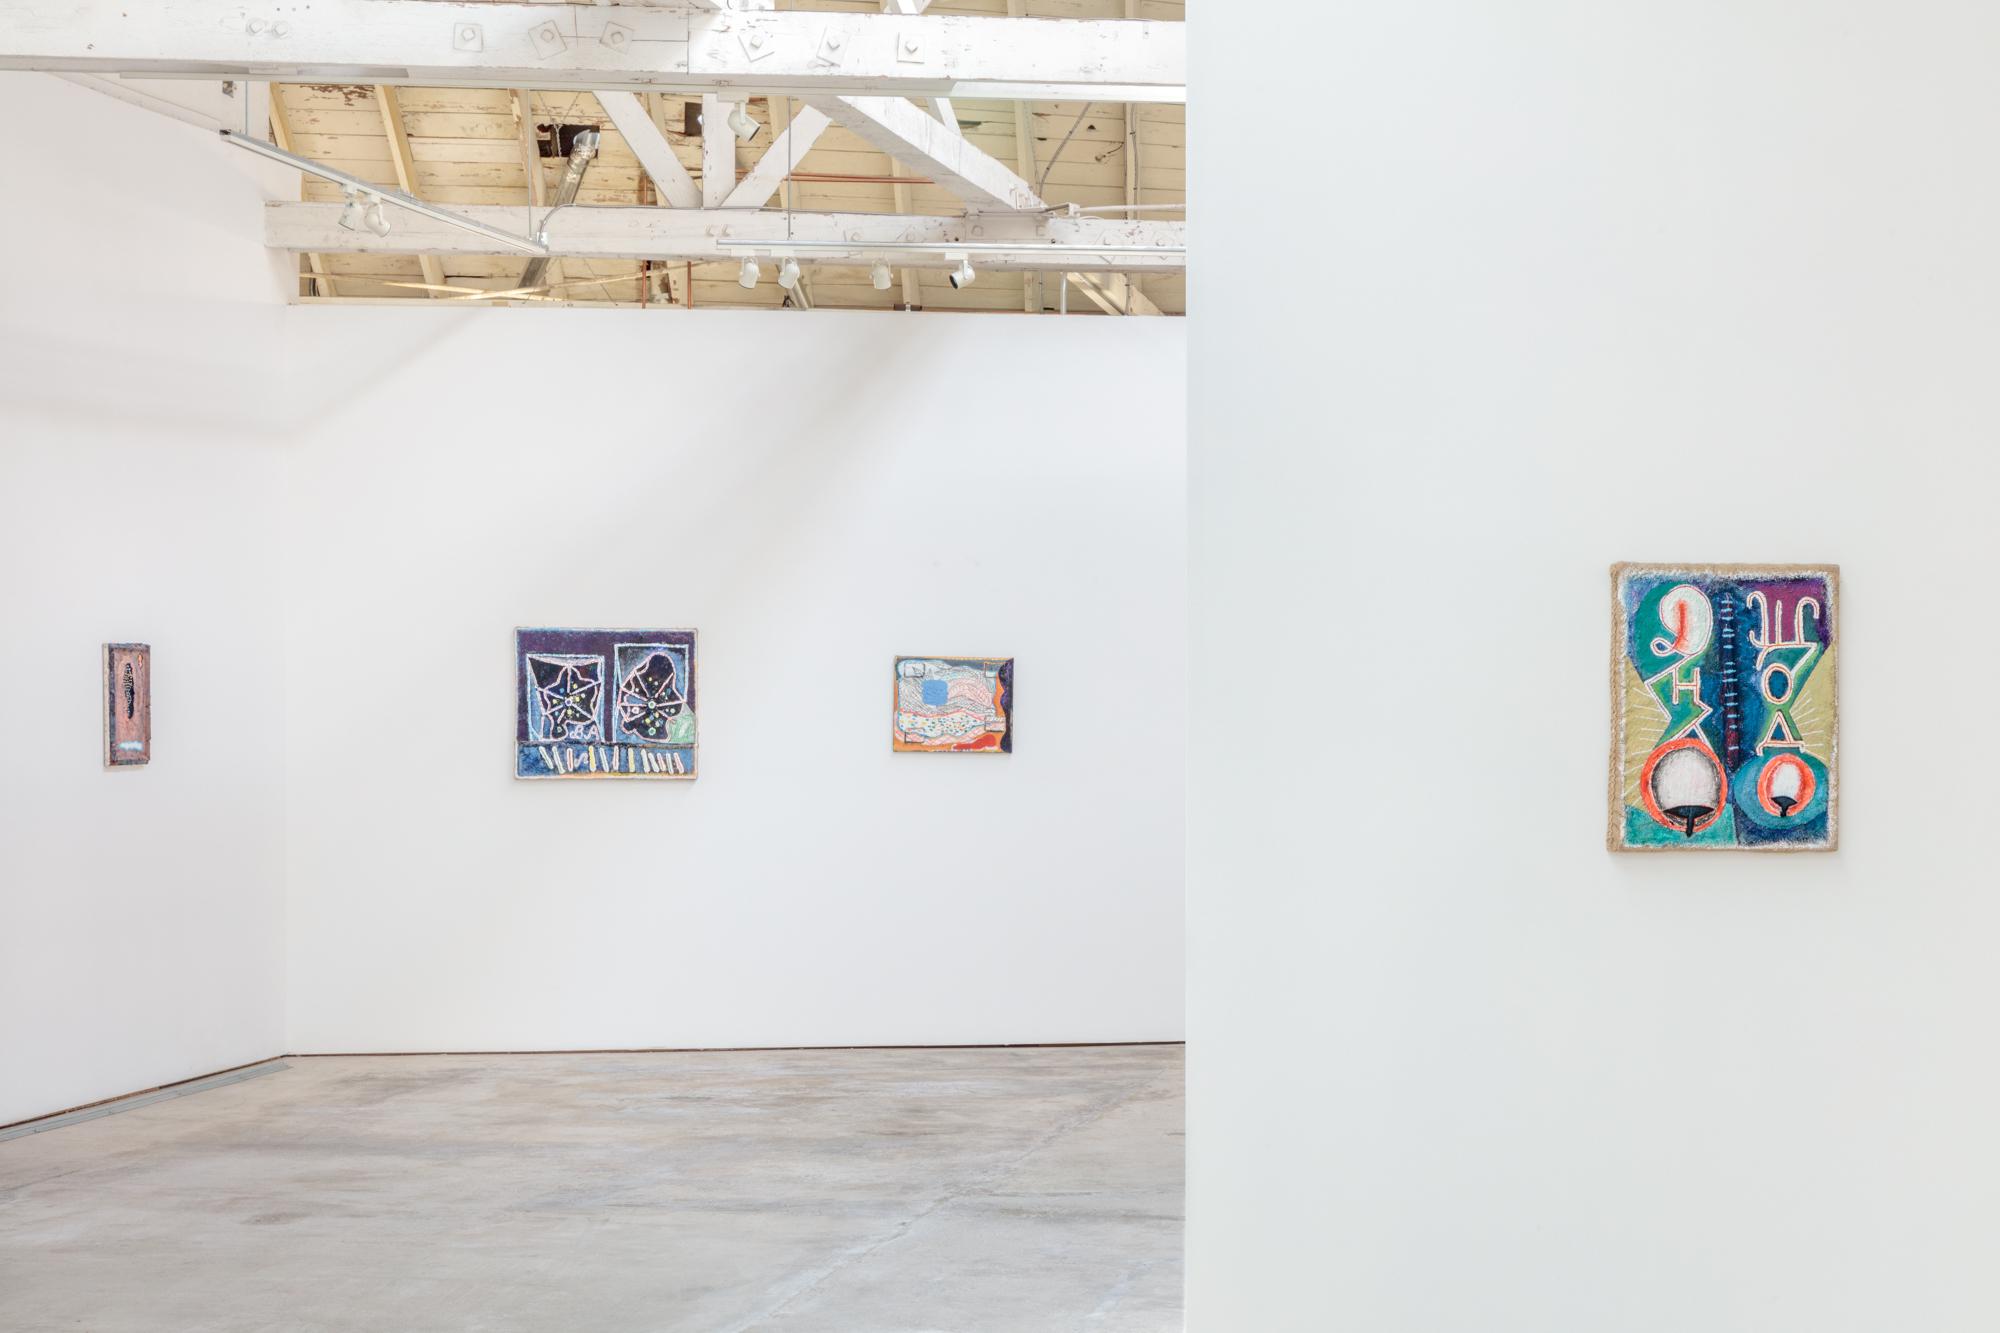 Installation view, Yevgeniya Baras: Towards Something Standing Open, the Landing, 2018